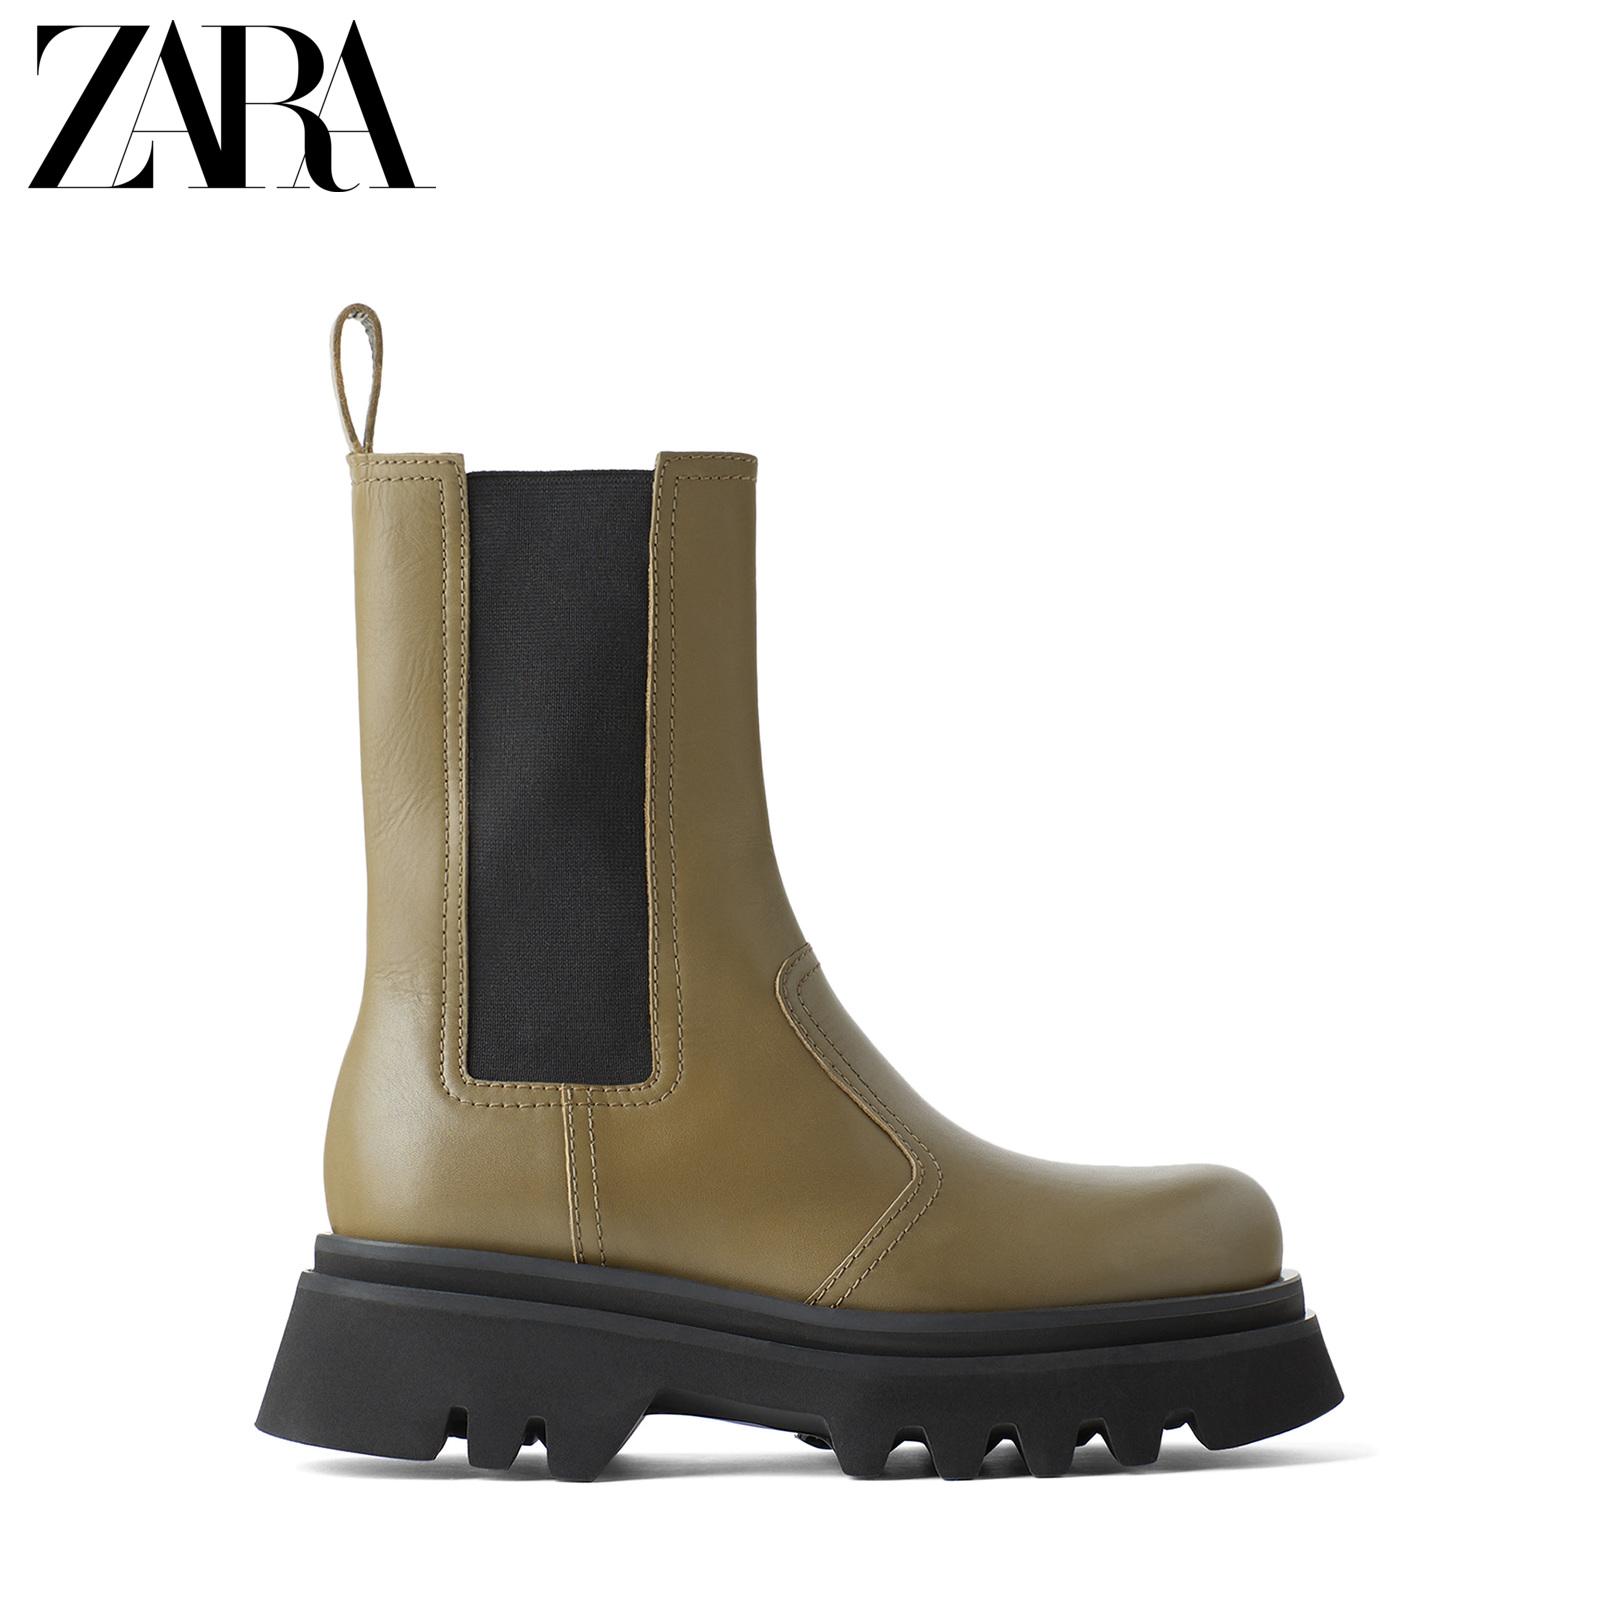 ZARA 新款 女鞋 绿色沟纹鞋底牛皮革真皮切尔西短靴 11112510030